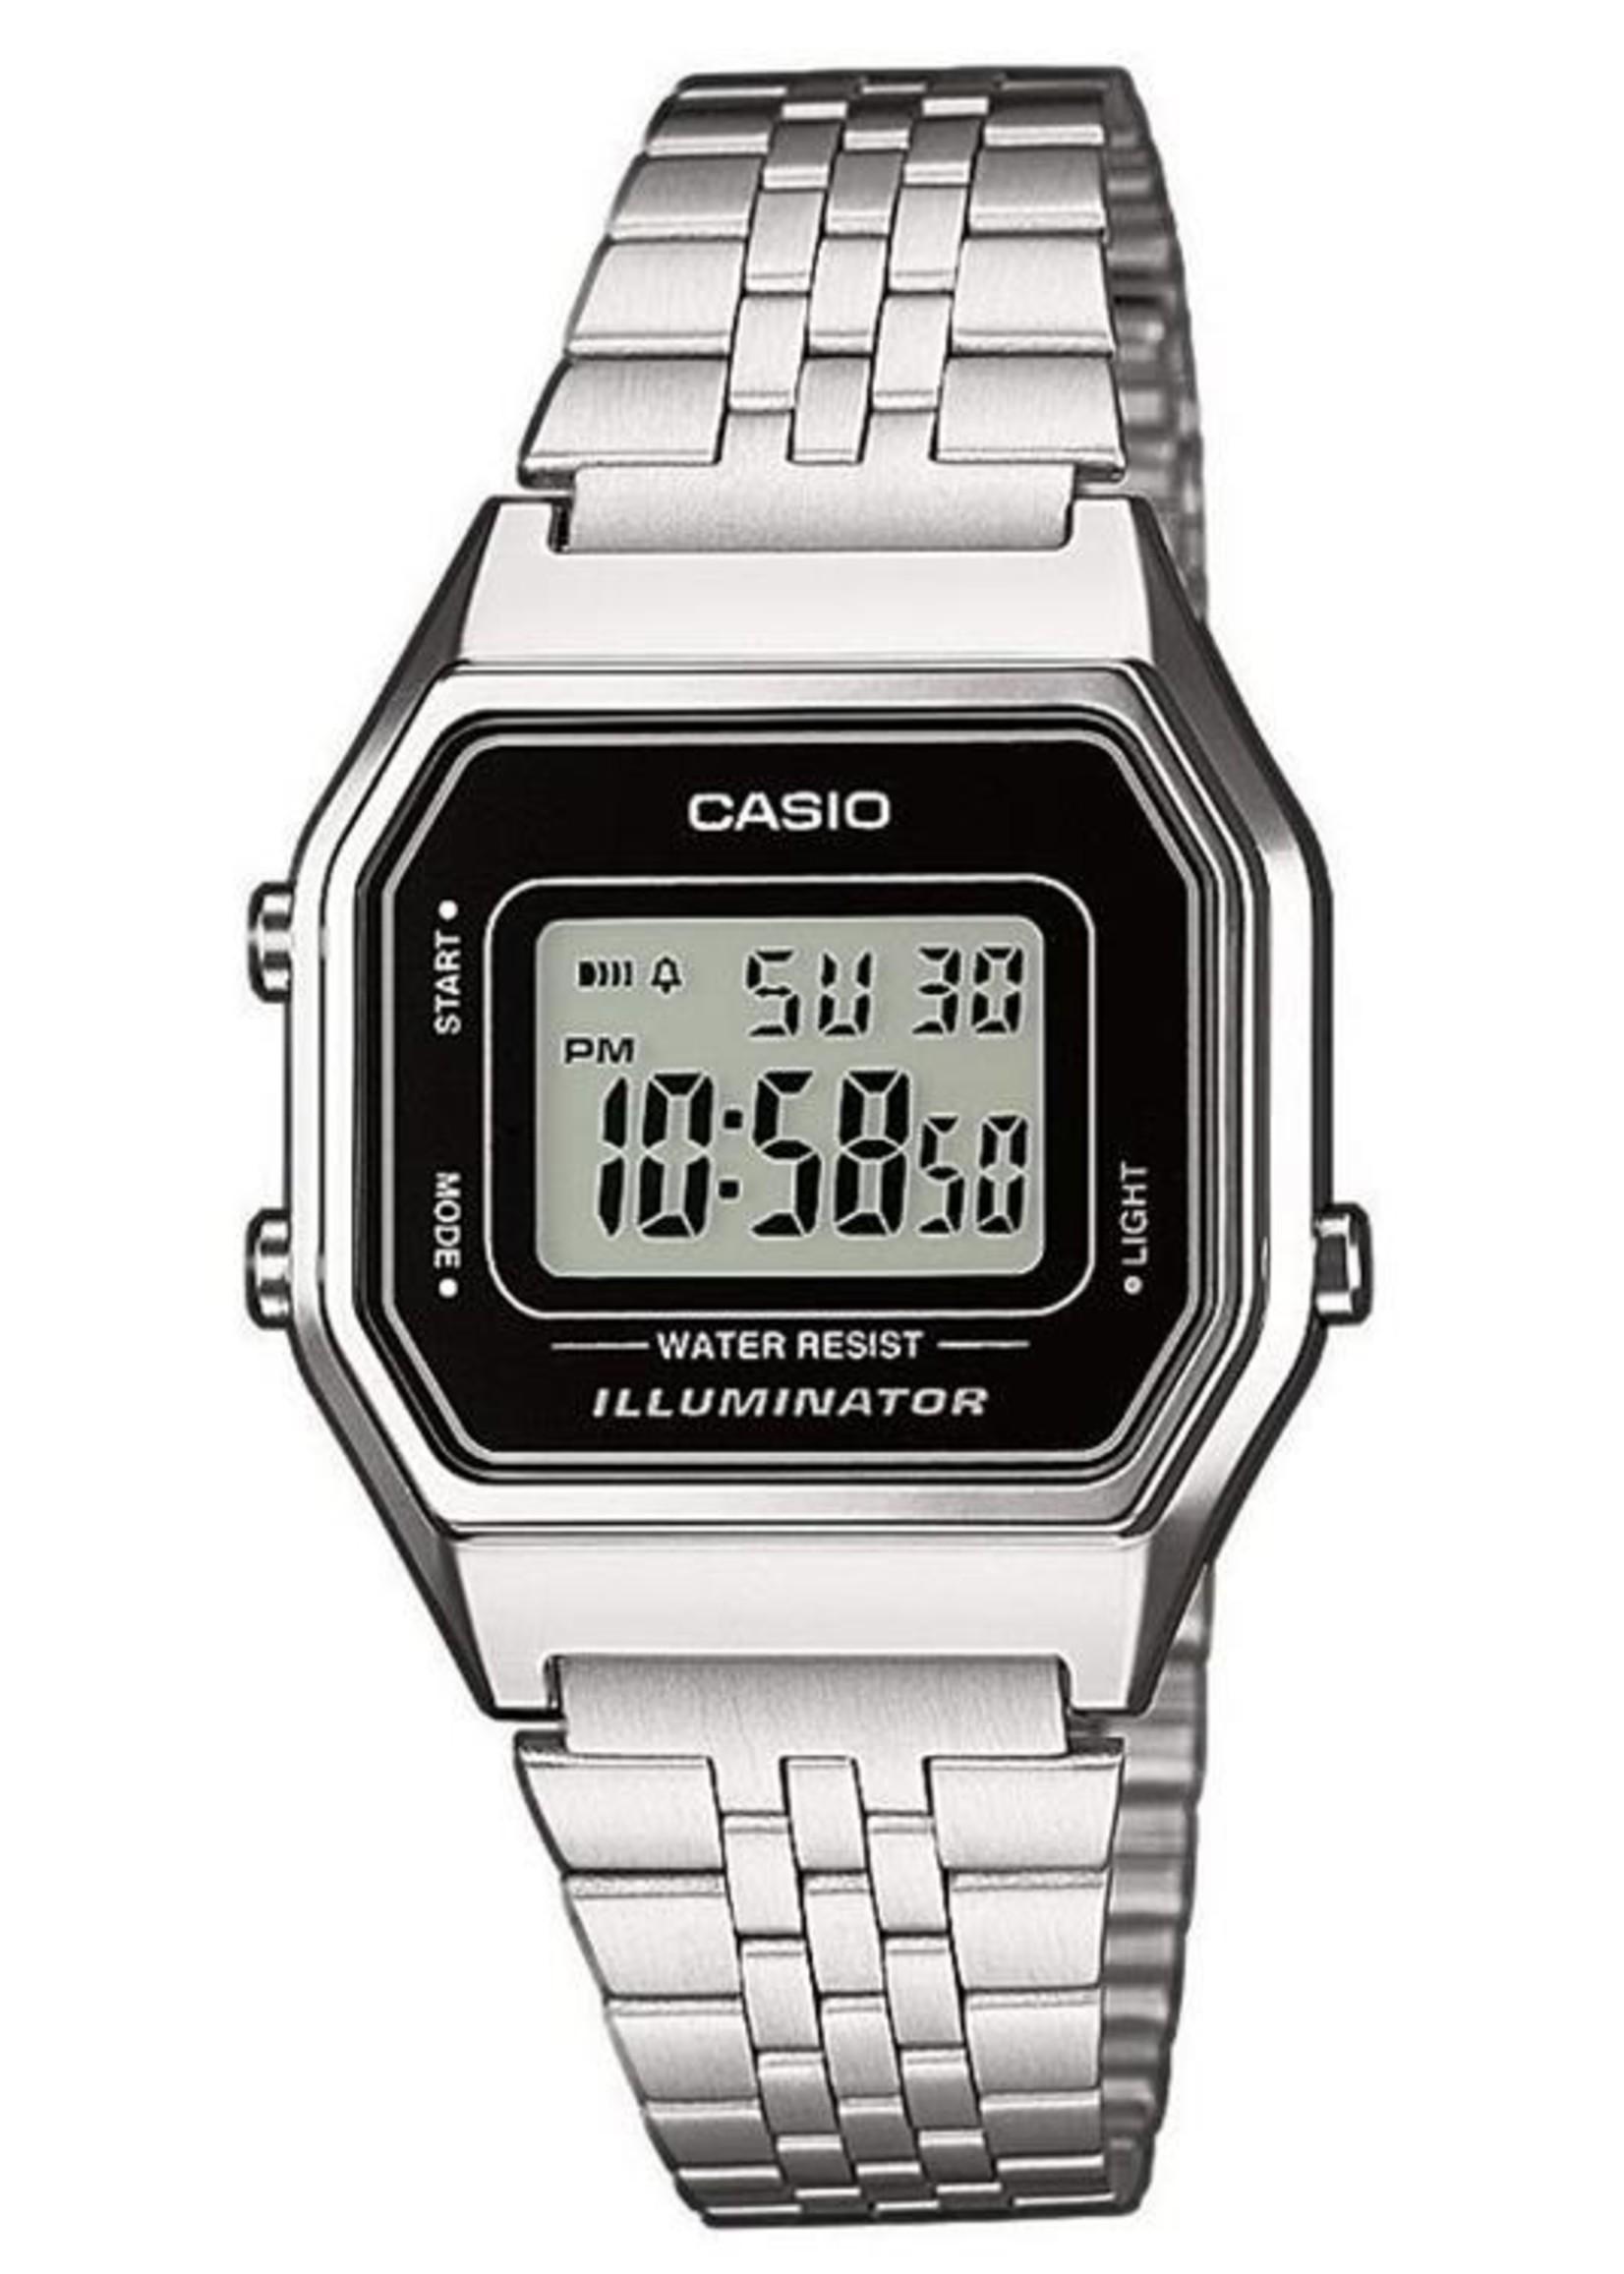 Casio la680wea-1ef